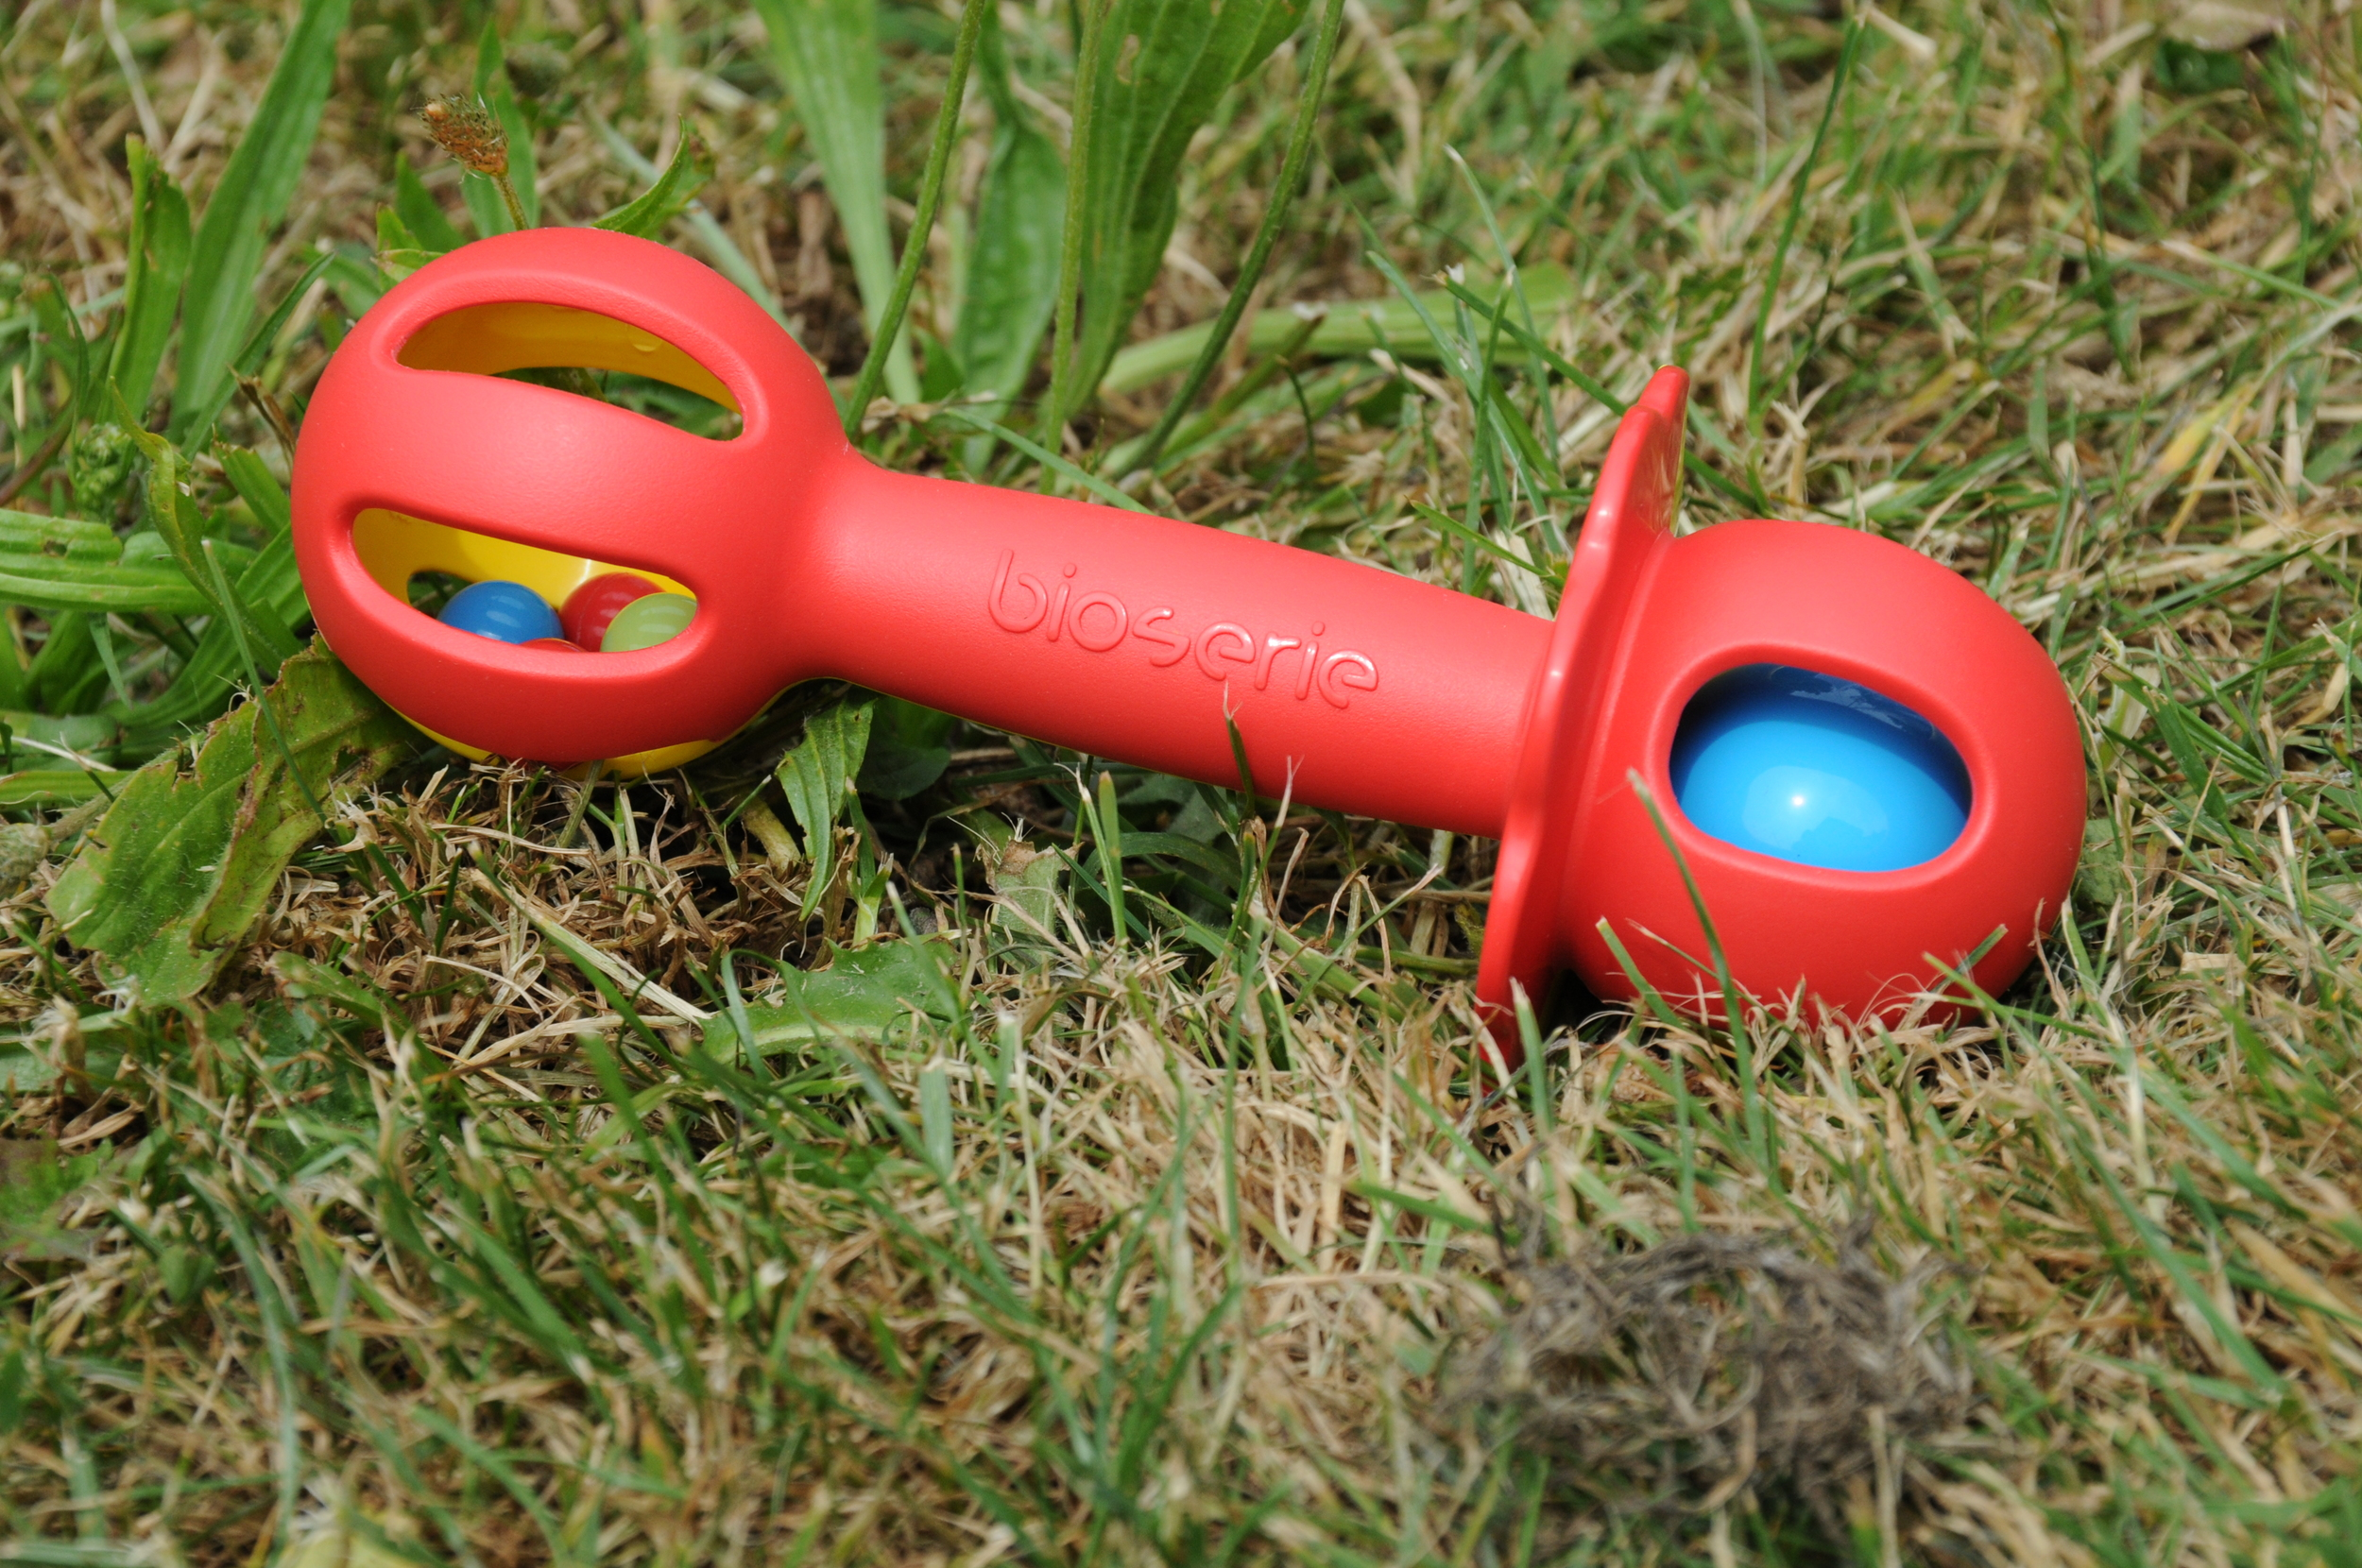 Bioserie baby rattle £7.99  Toyella